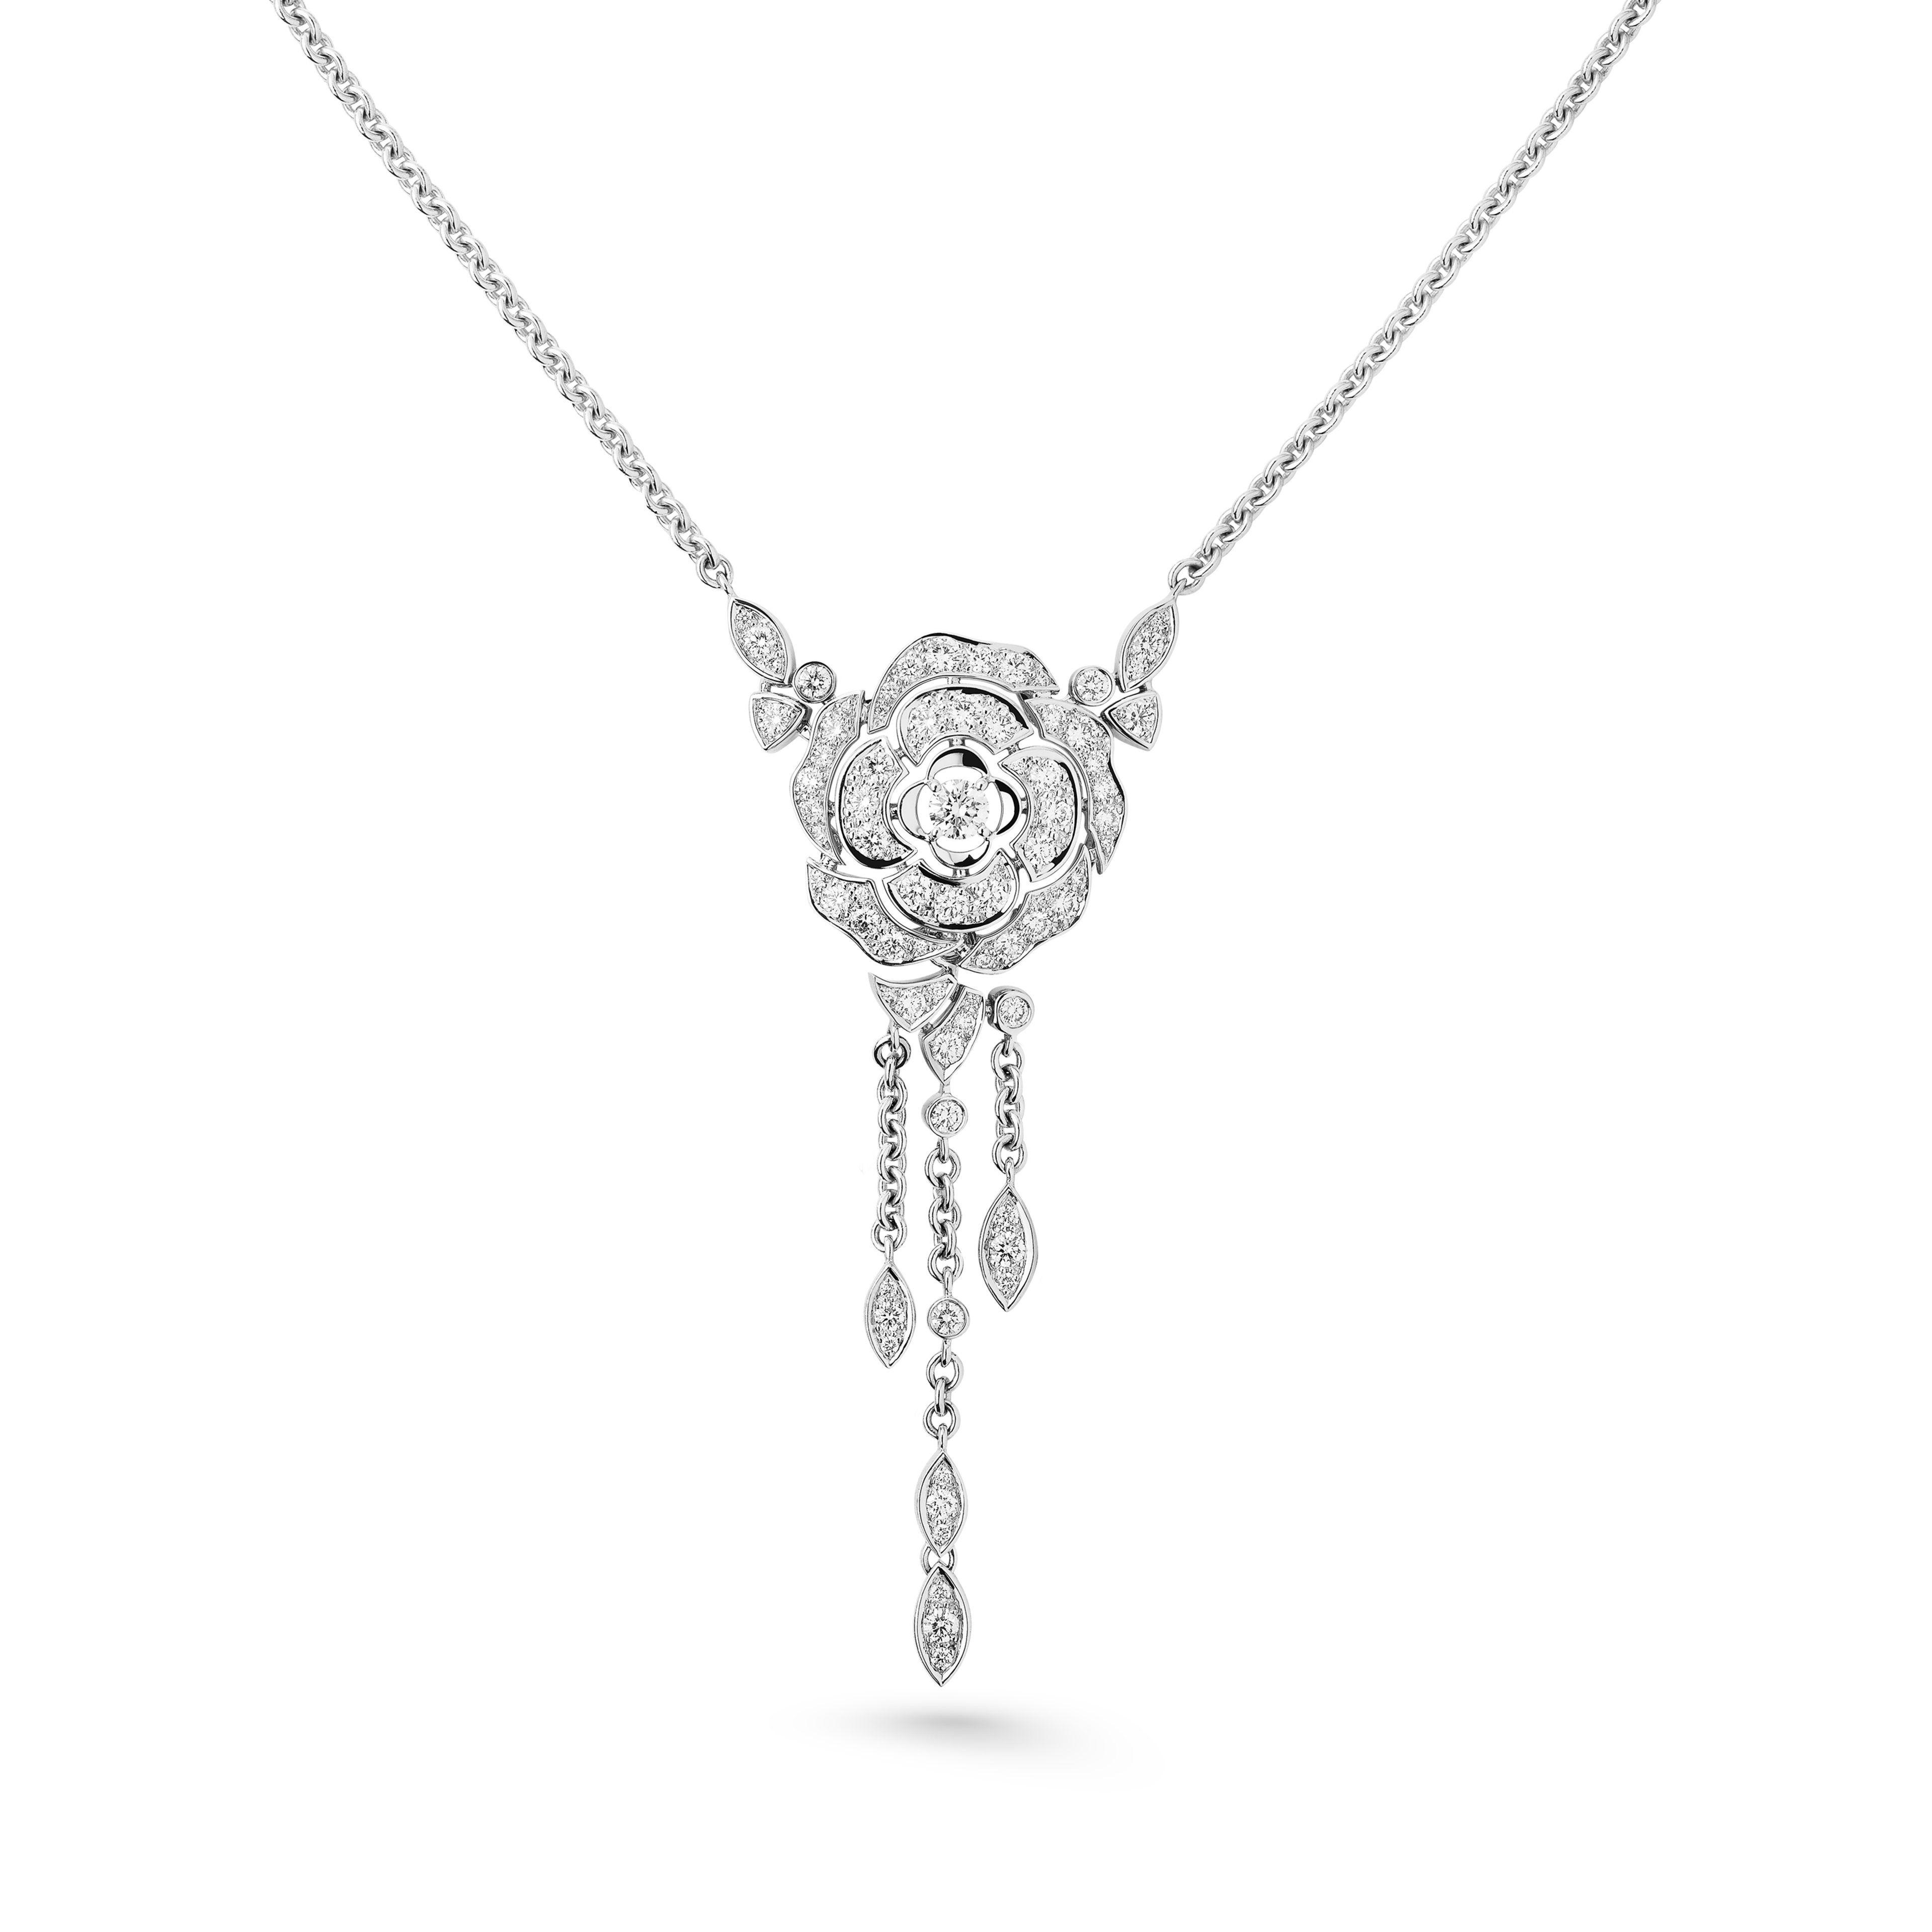 7c28282e475d09 Camélia necklace - Bouton de Camélia necklace in 18K white gold and diamonds  with one center diamond - Alternative view - see full sized version